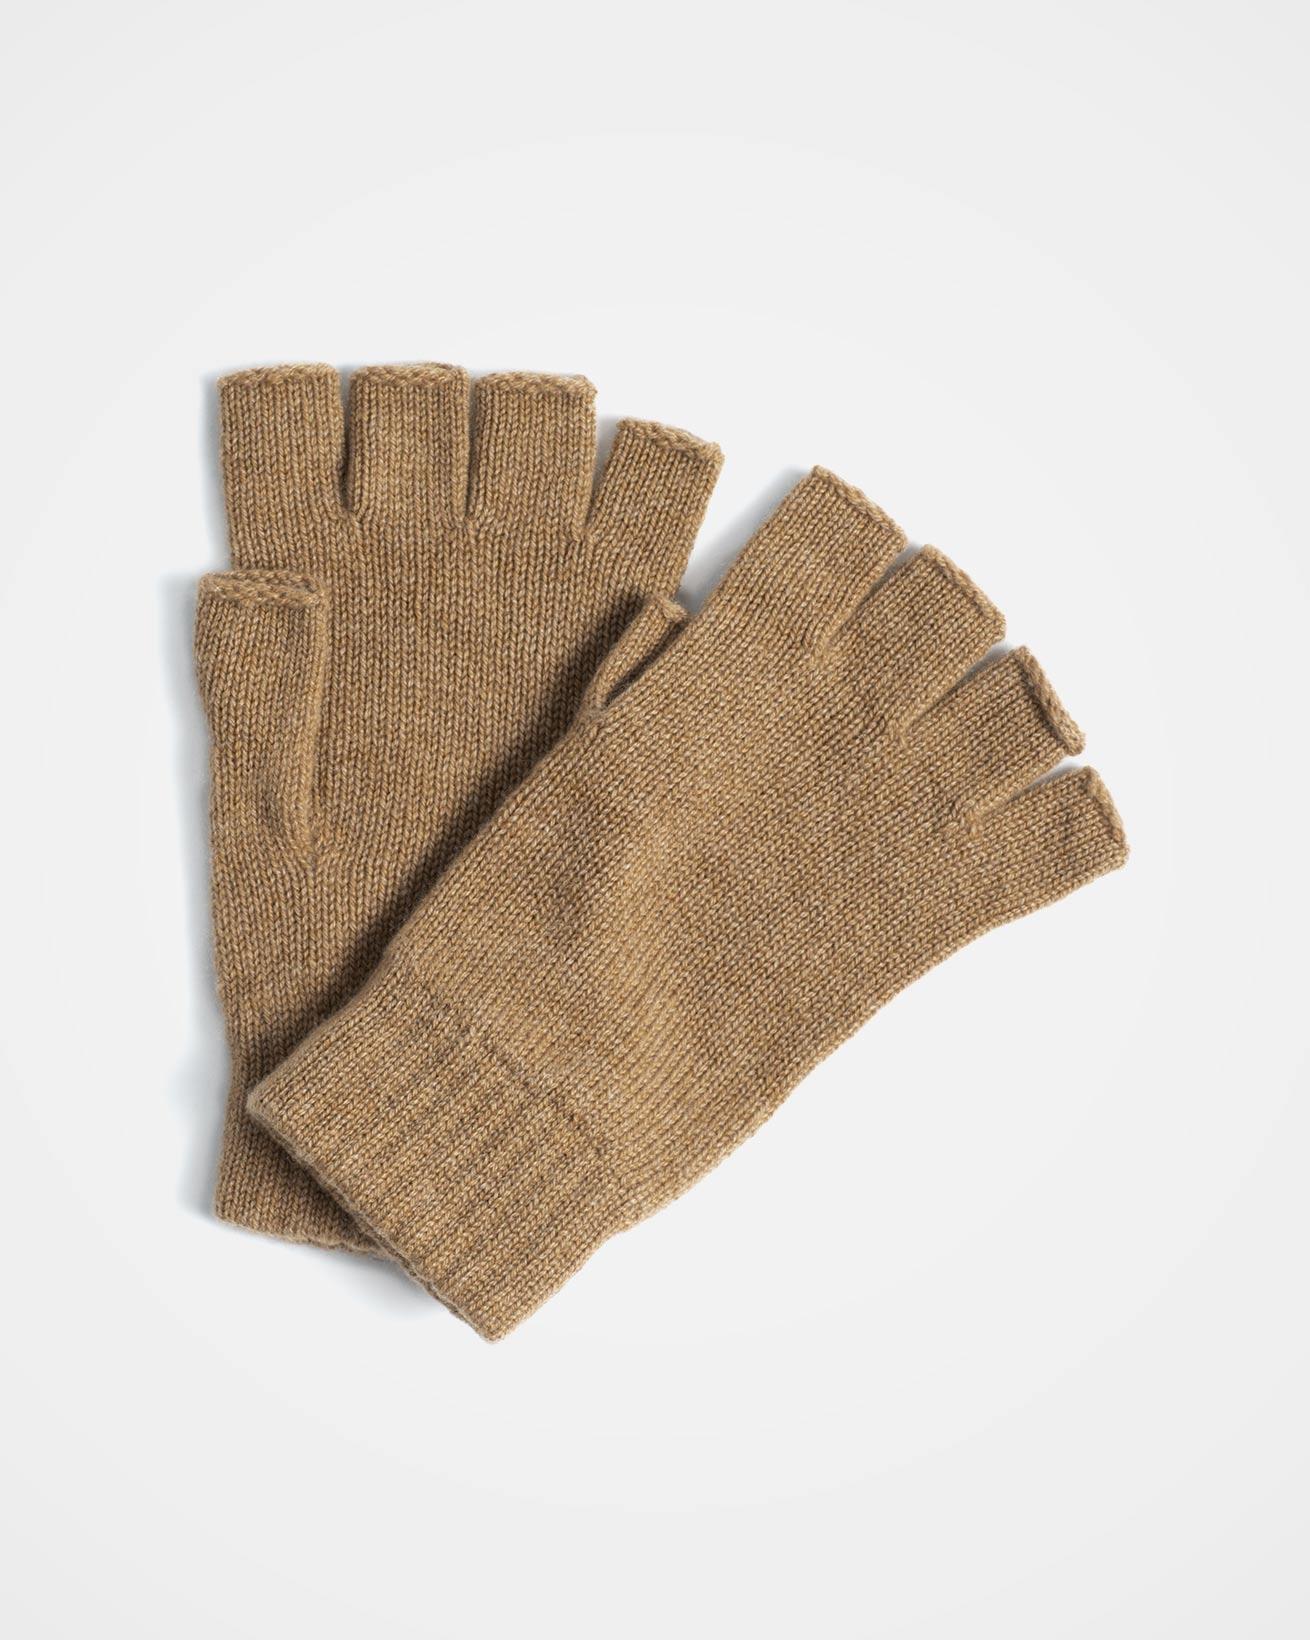 7491_unisex-cashmere-glove-fingerless_dark-camel_web.jpg